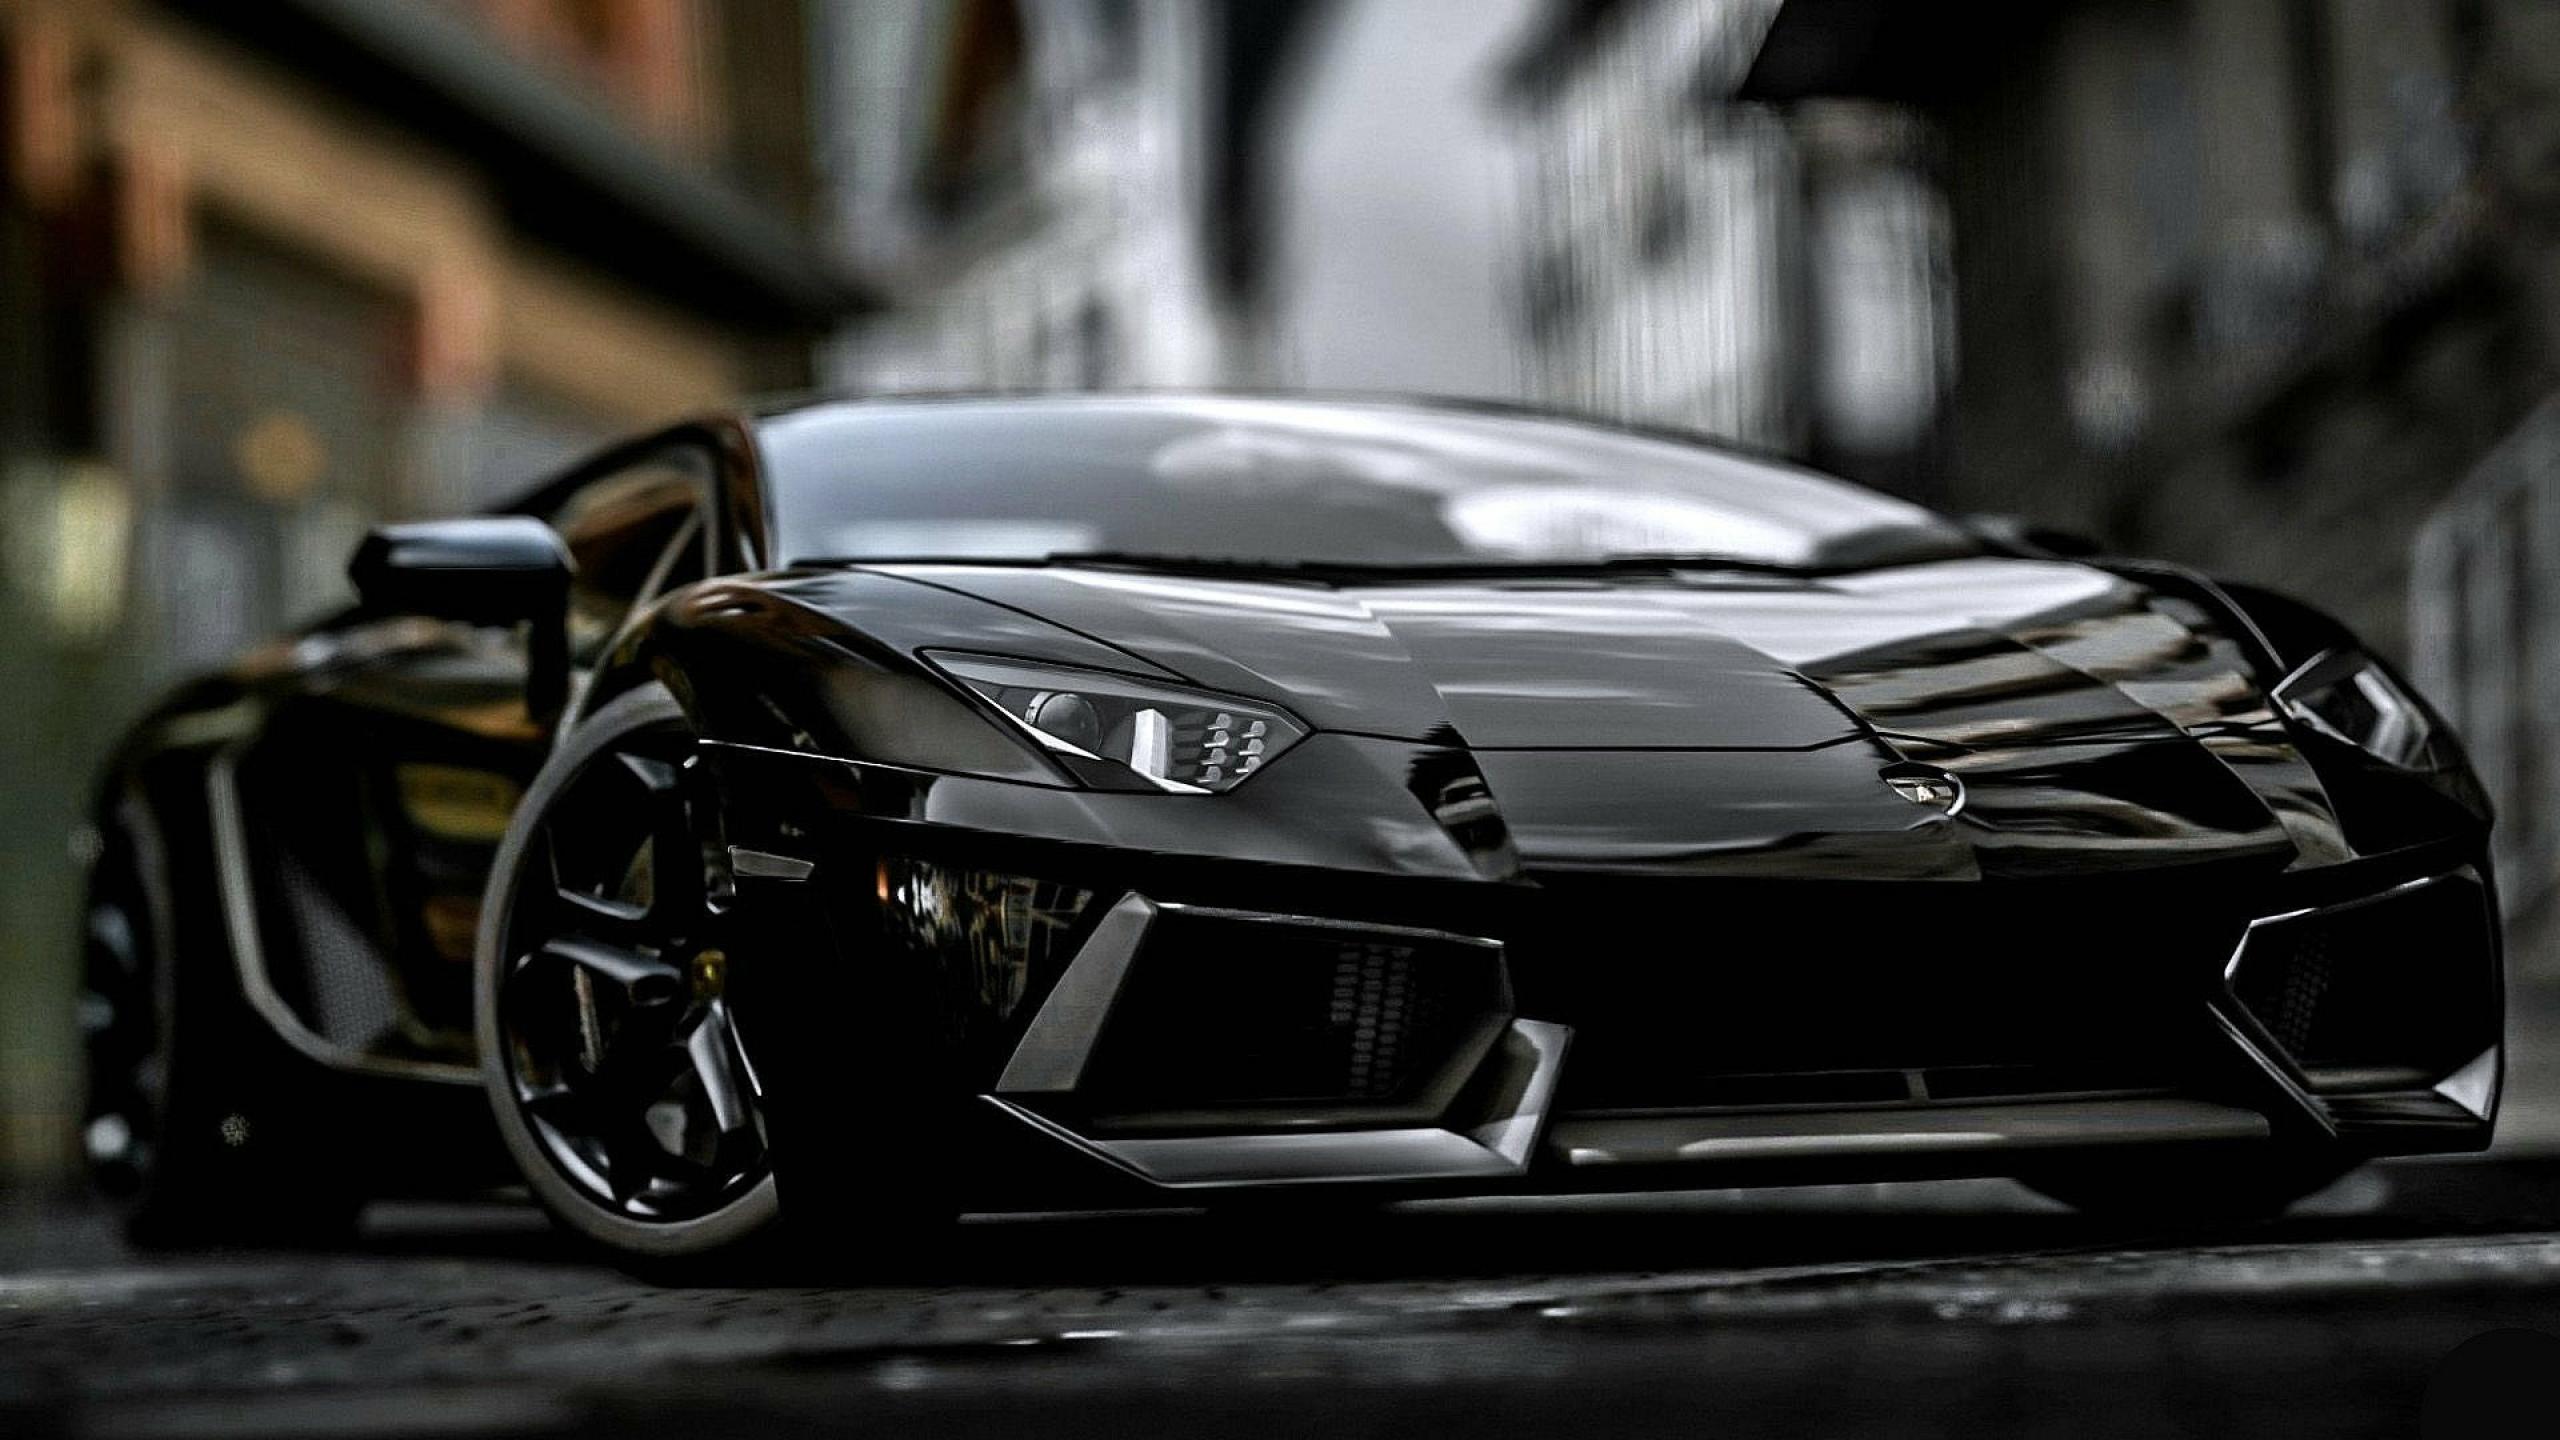 Pin By Zeekash Faiz Ali On Dream Rides With Images Lamborghini